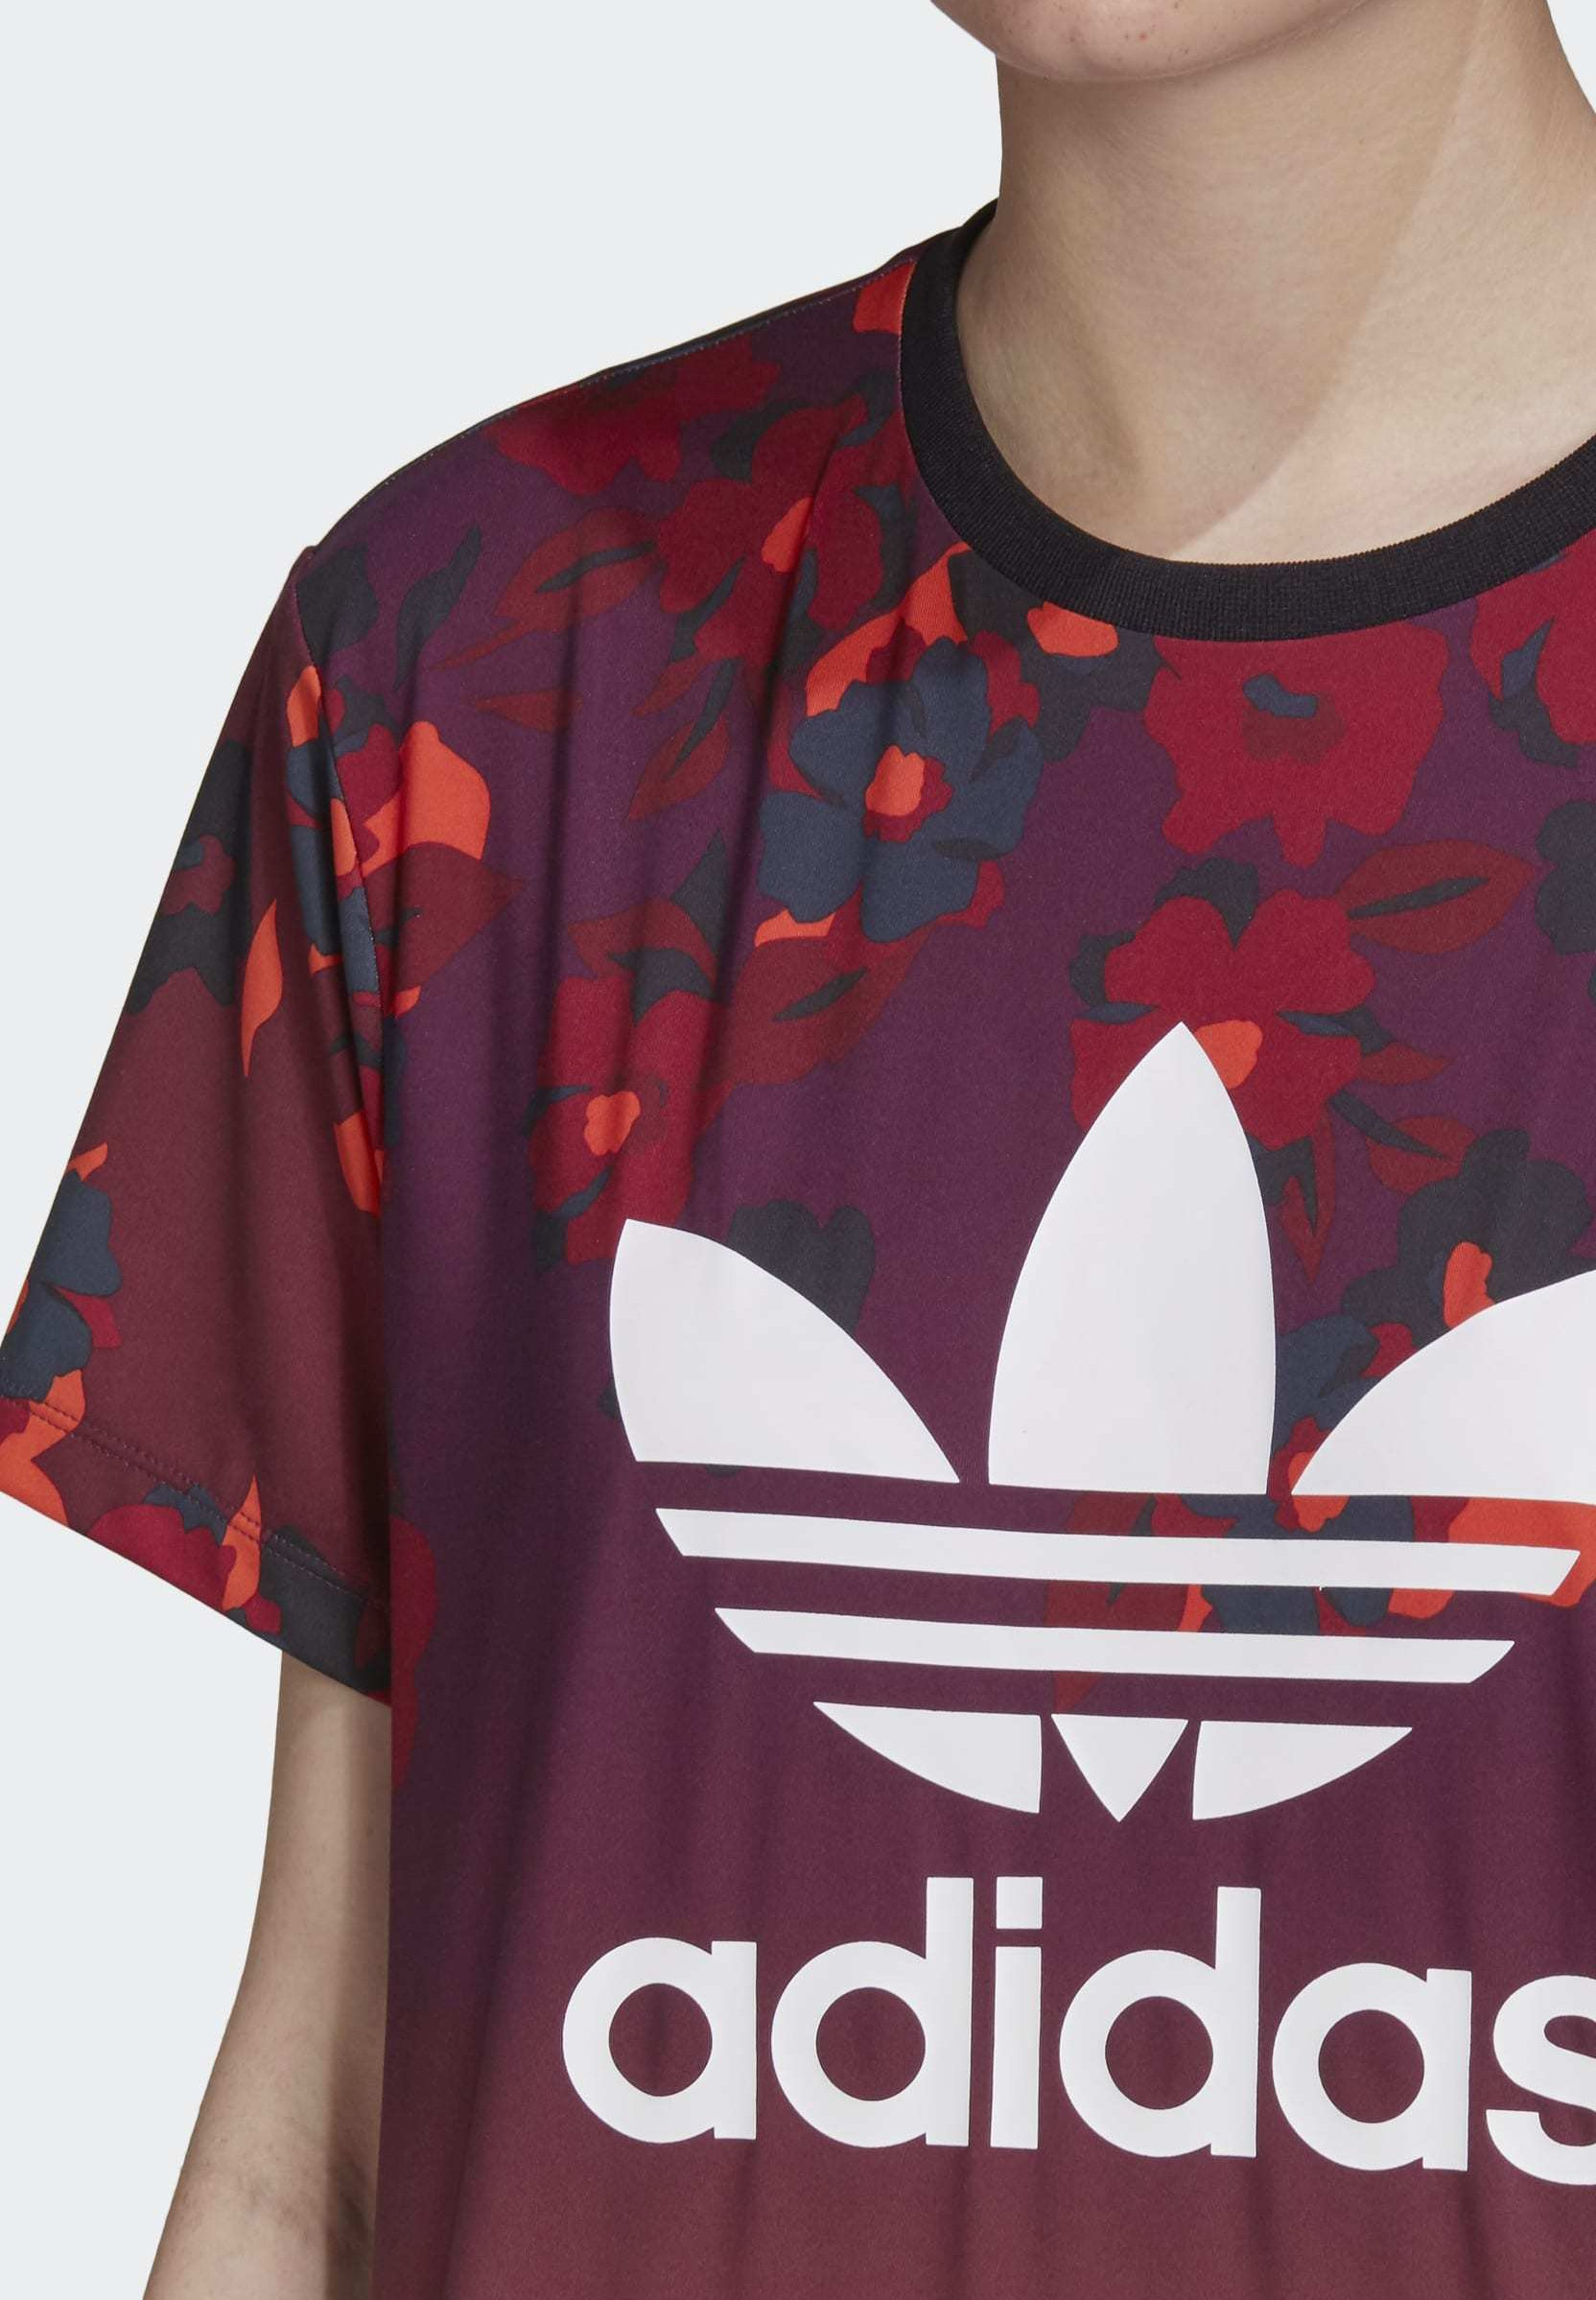 adidas Originals HER STUDIO LONDON LOOSE T SHIRT T shirts